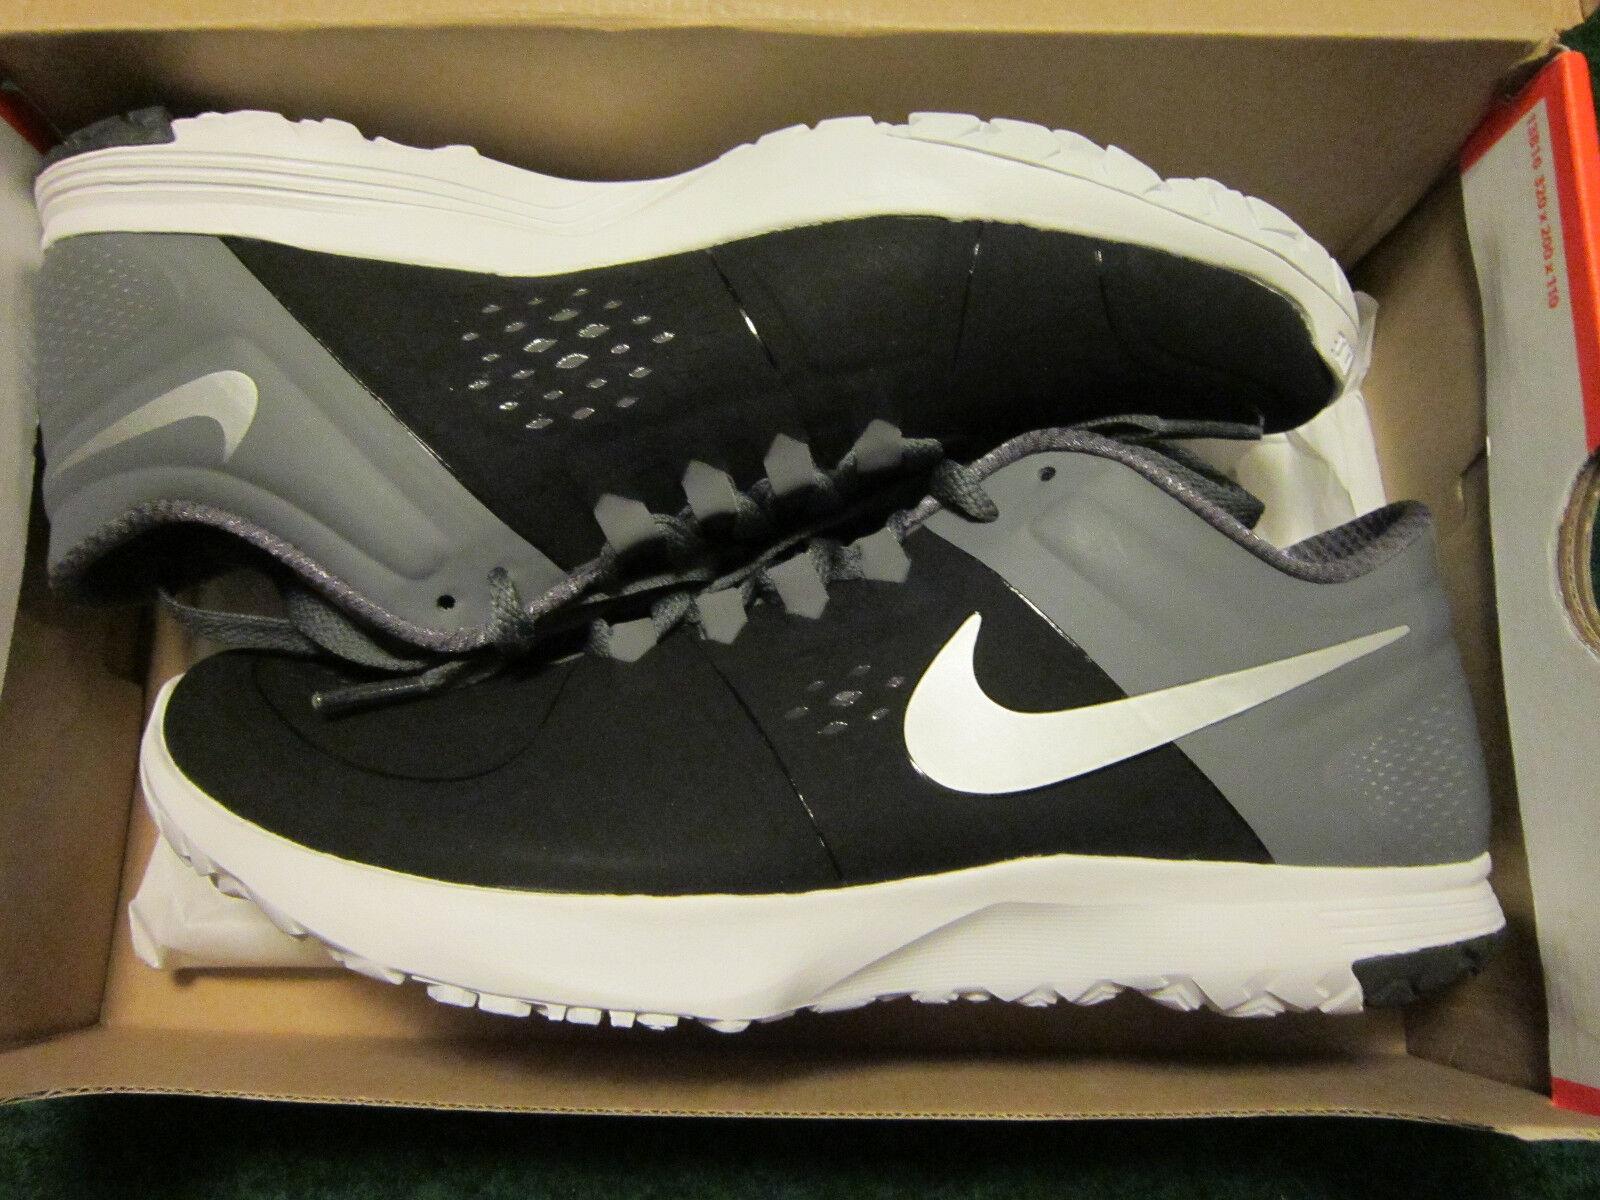 Men's Nike FS LITE TRAINER Shoes Size 8.5 Black & Gray 615972-001 New in Box